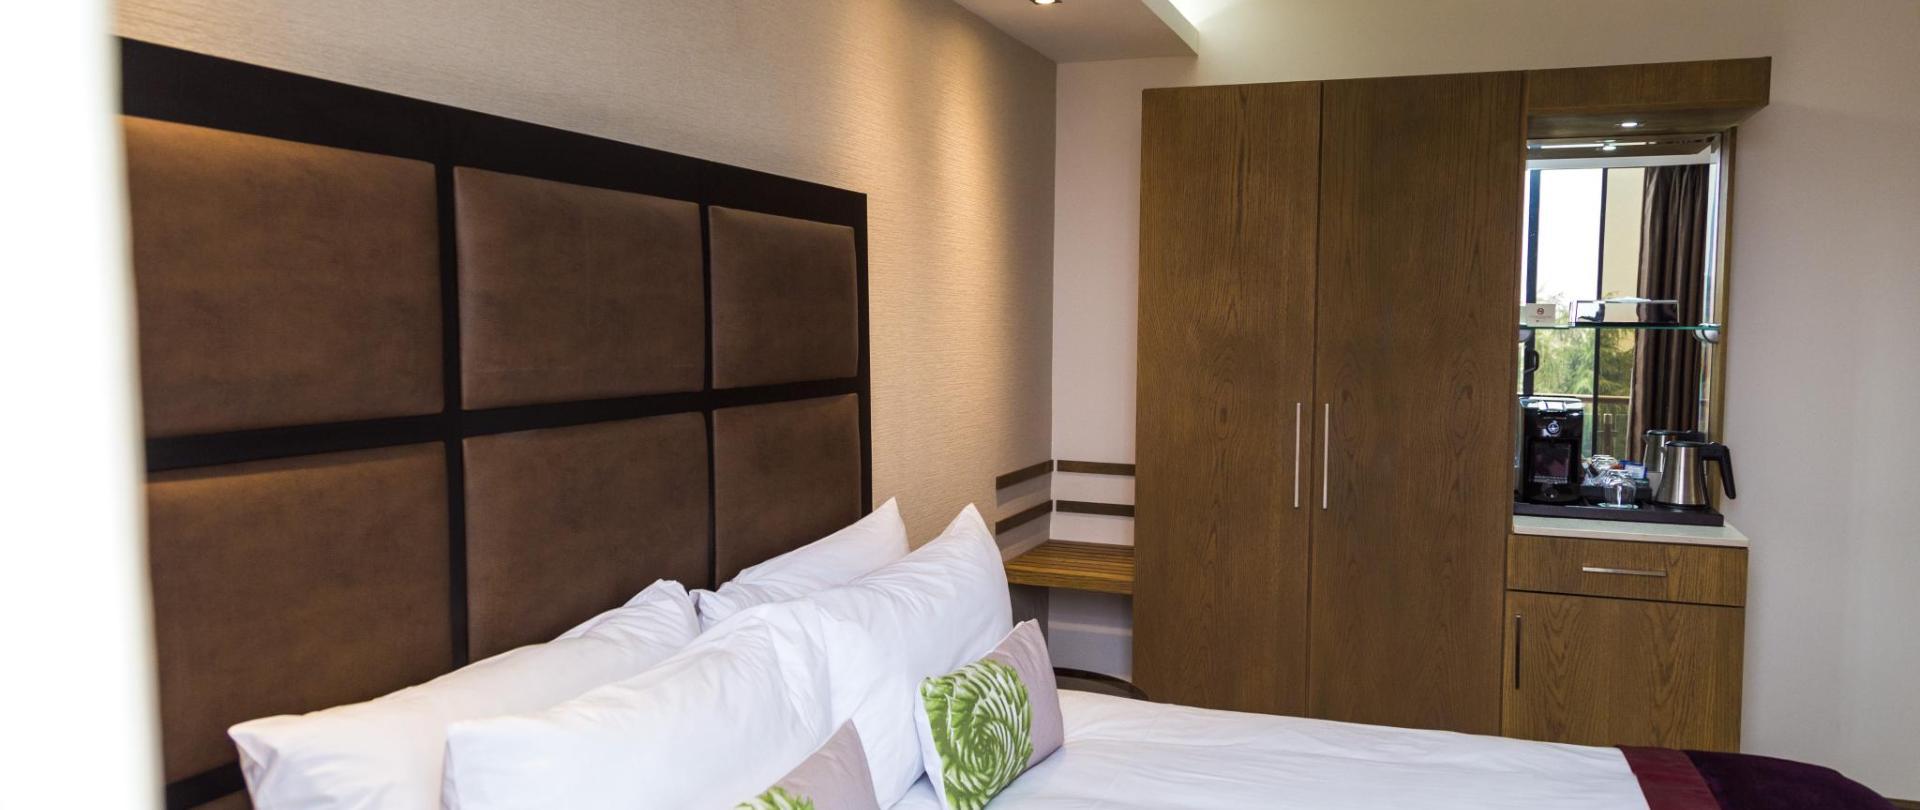 room-70.jpg